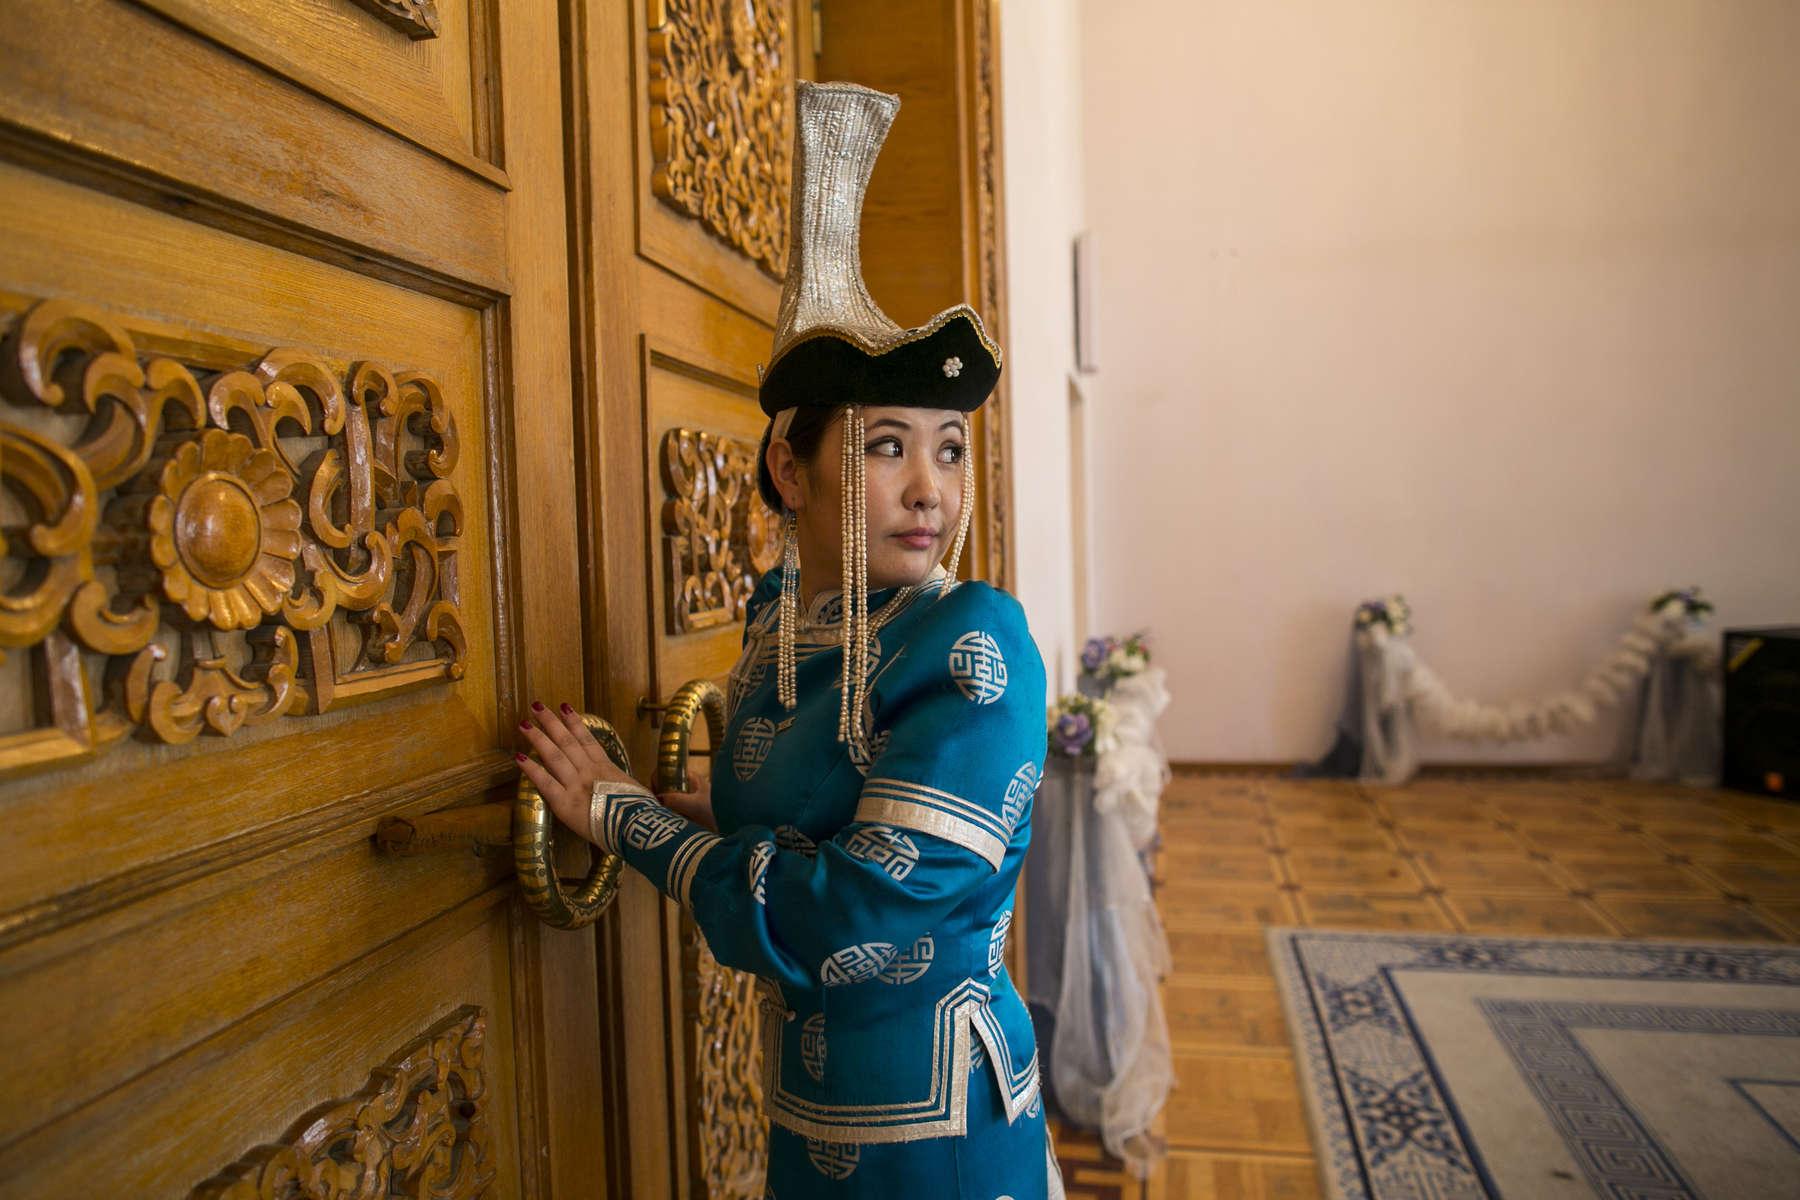 mongolia_gallery010